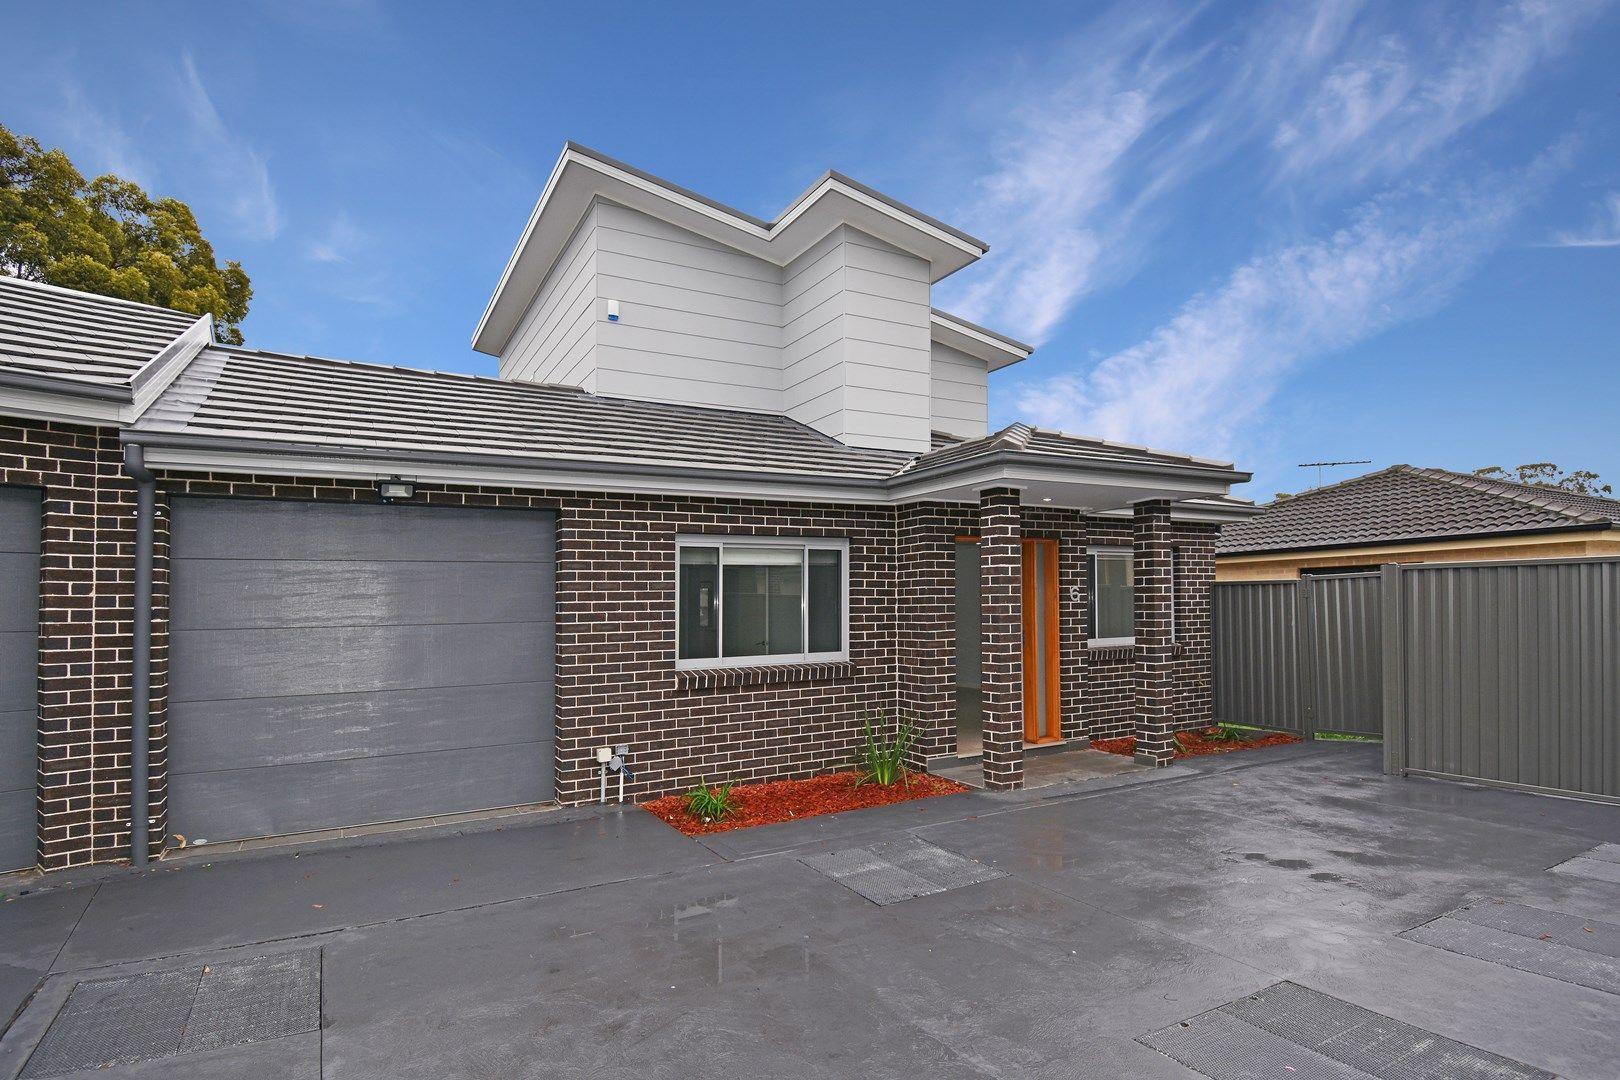 6/8-10 Gurrawillie Street, Villawood NSW 2163, Image 0